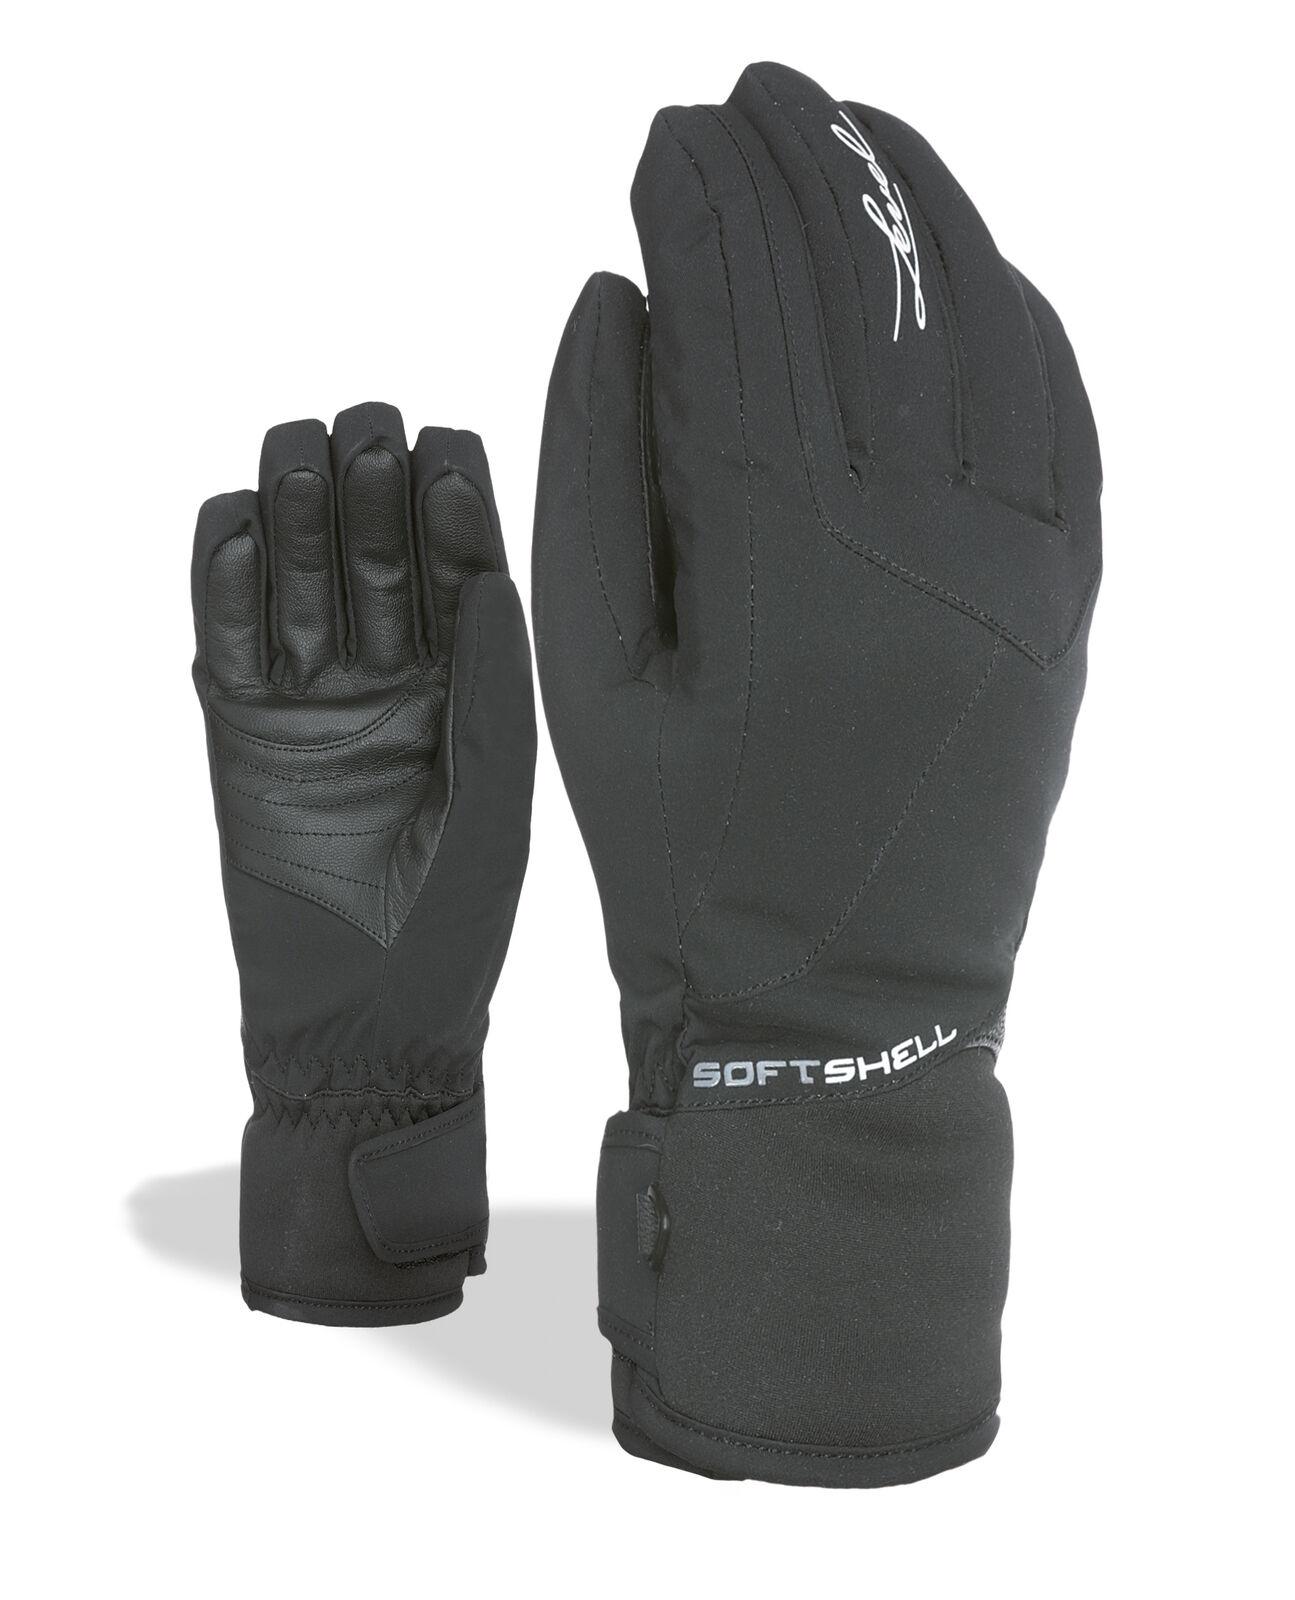 Level Handschuh Zoe W black wasserdicht atmungsaktiv wärmend